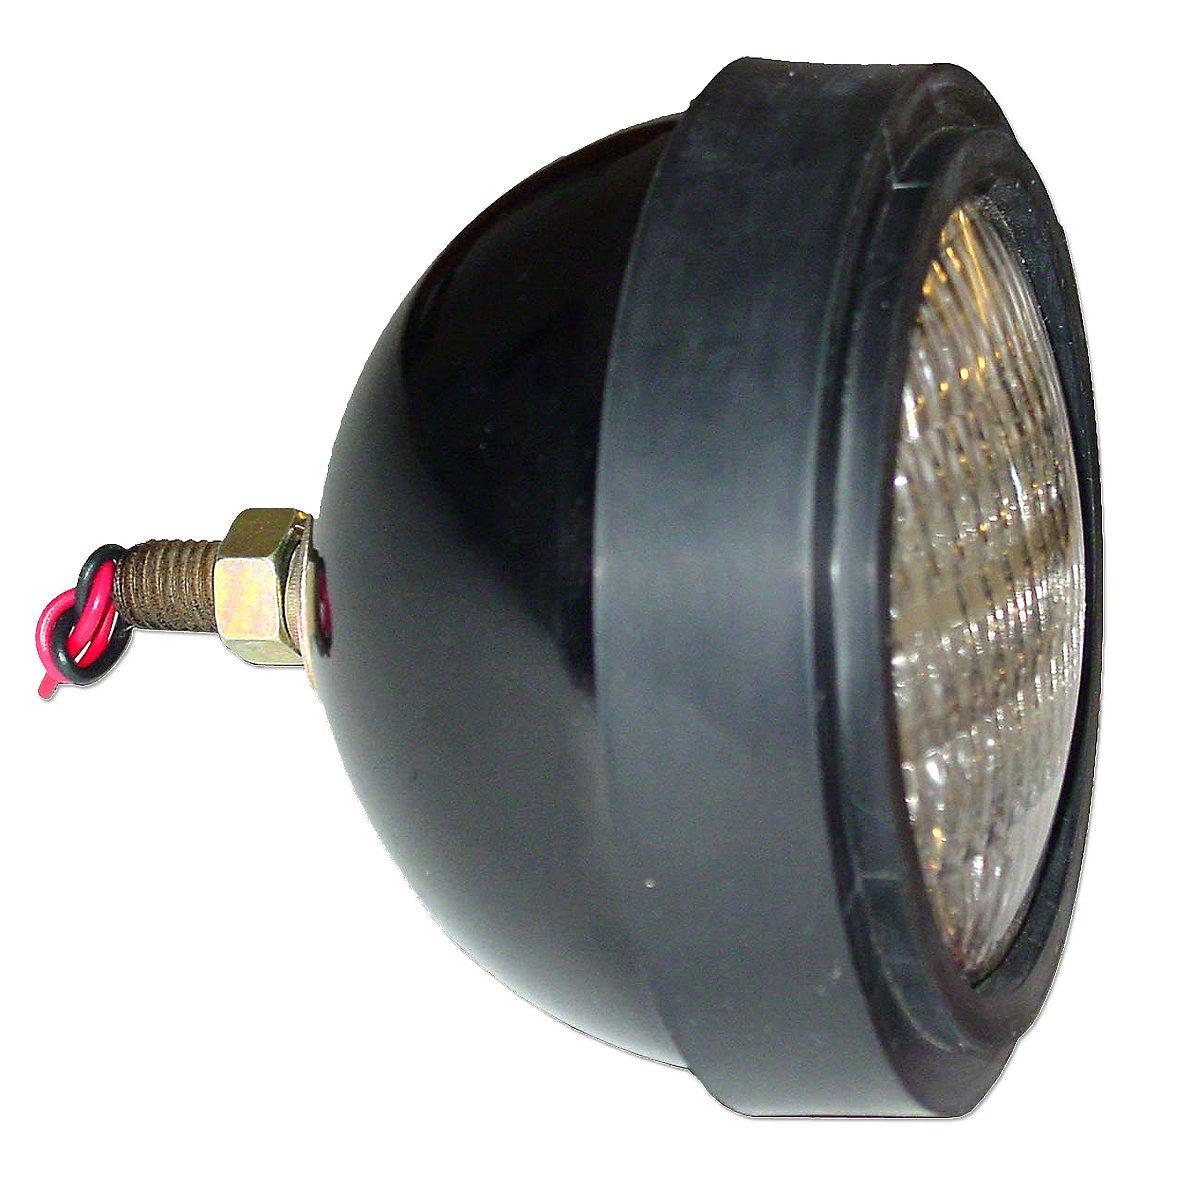 12 Volt Sealed Beam Headlight For Allis Chalmers: 190XT, 170, 175, 180, 185, 190, 200, 6040, 6060, 6080, 7000, 7010, 7020, 7030, 7040, 7045, 7050, 7060, 7080.